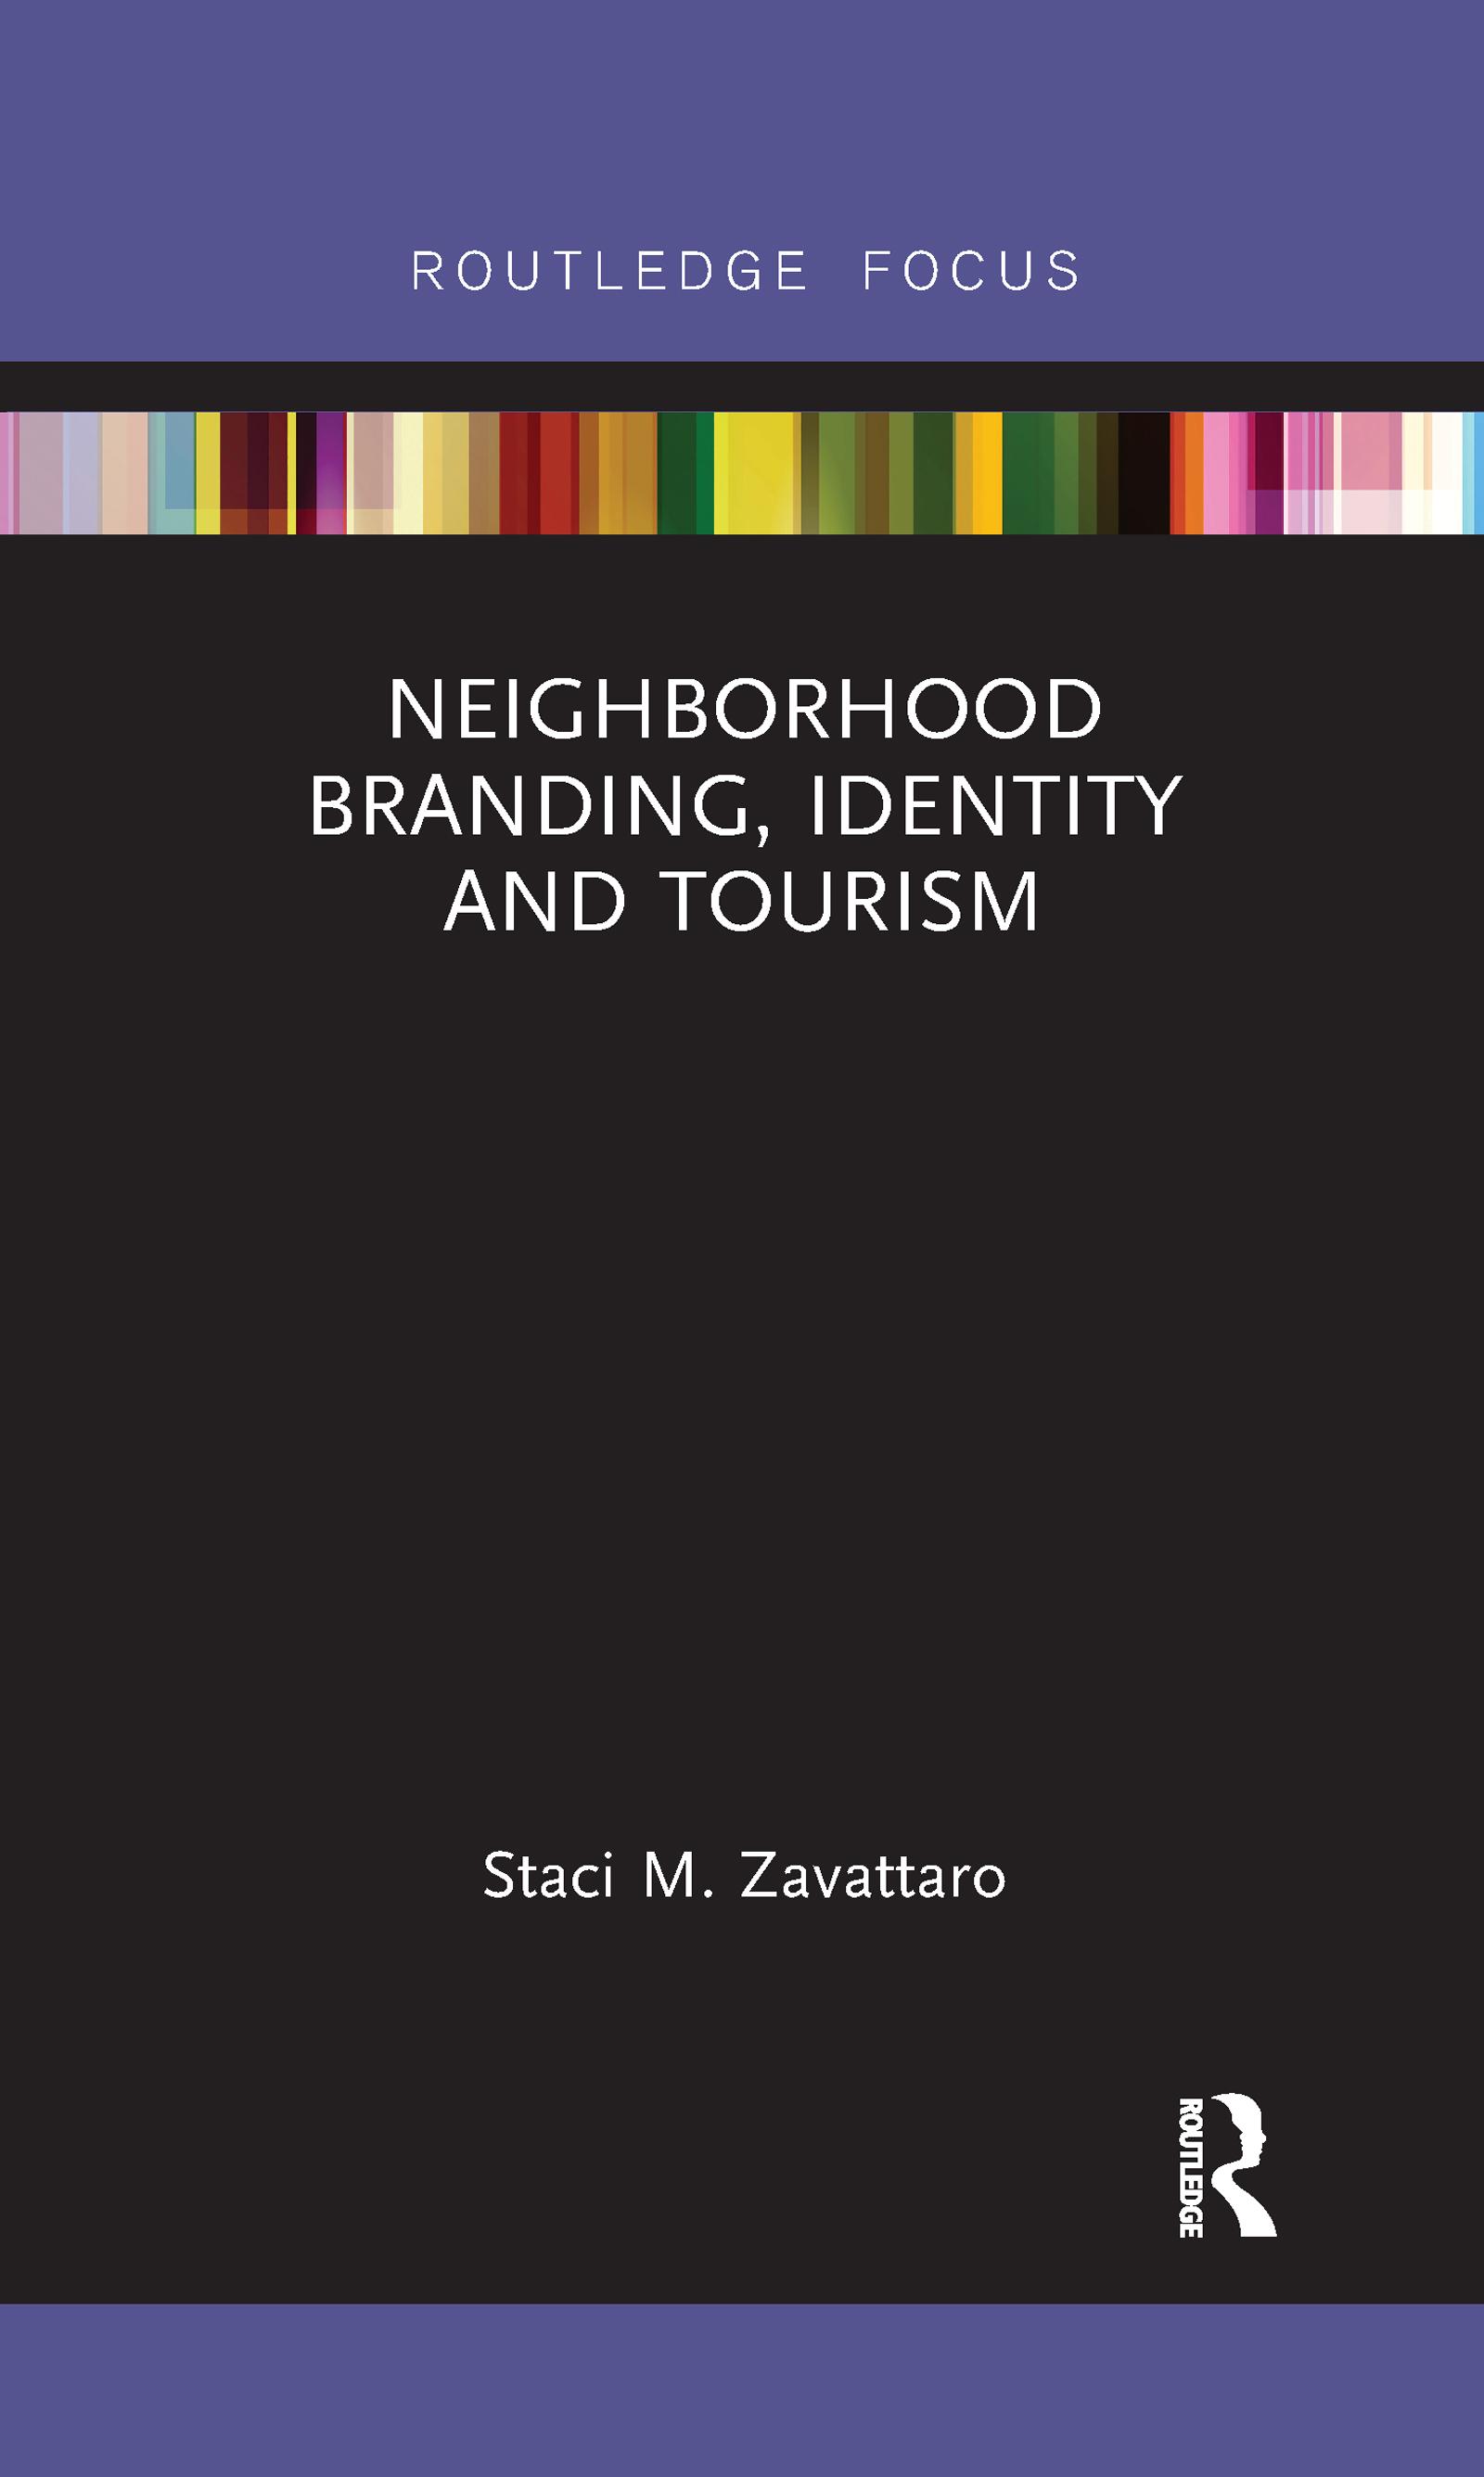 Neighborhood Branding, Identity and Tourism